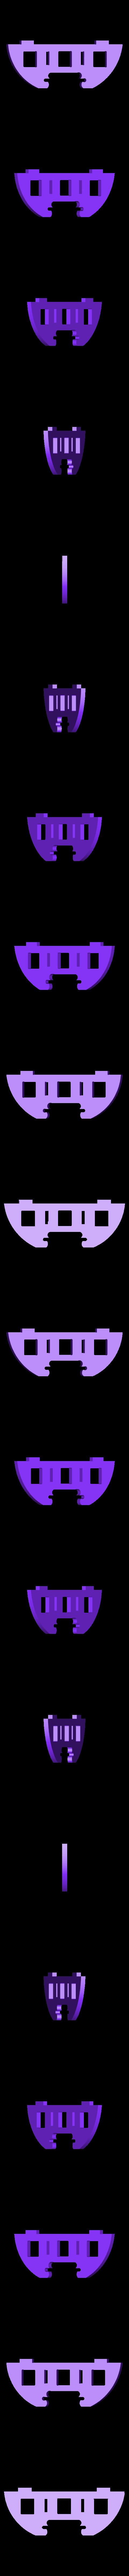 tube_half_moon_with_three_holes.stl Download free STL file OpenROV Underwater Robot • 3D printable design, PortoCruz675